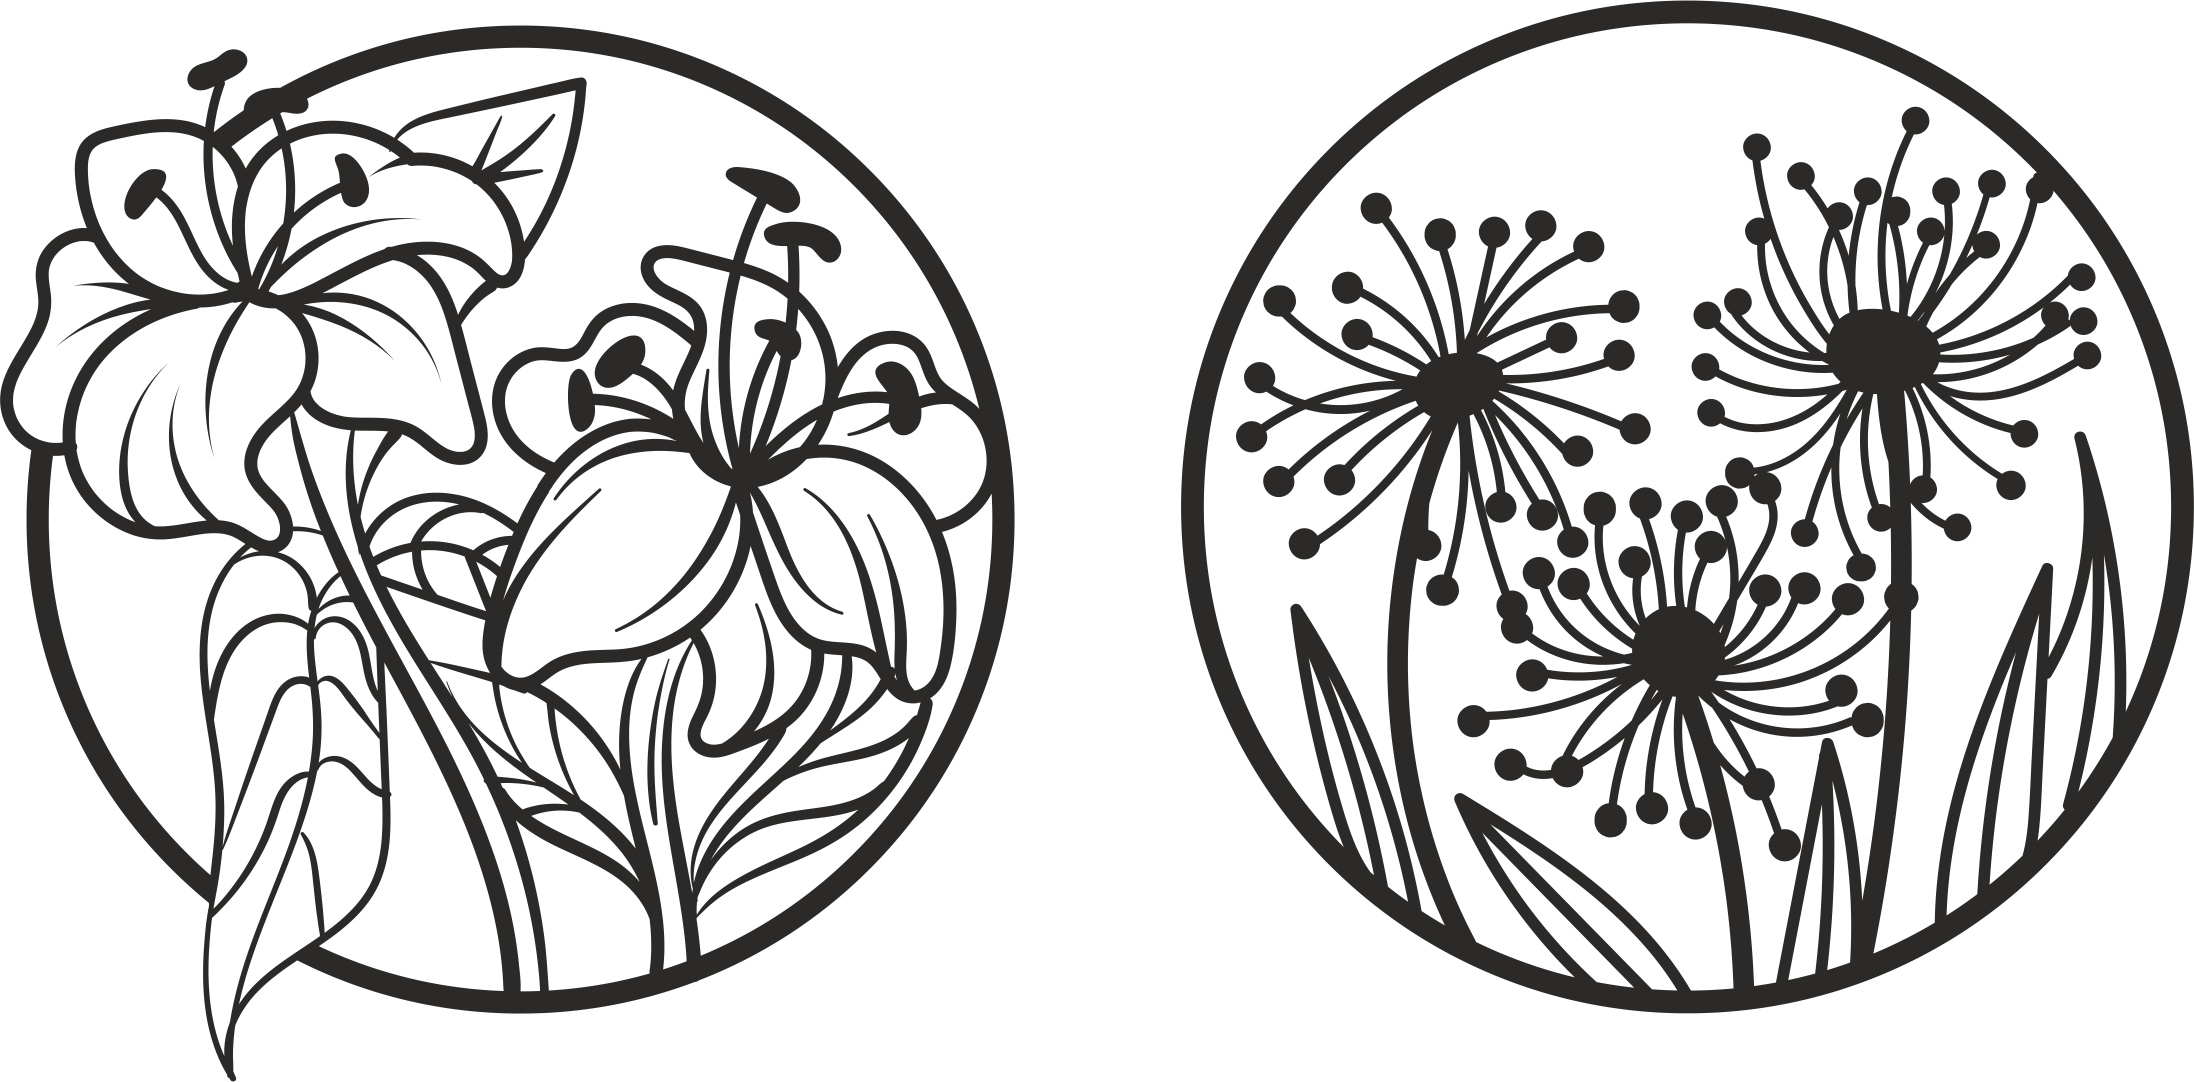 Laser Cut Engraving Floral Designs Free Vector